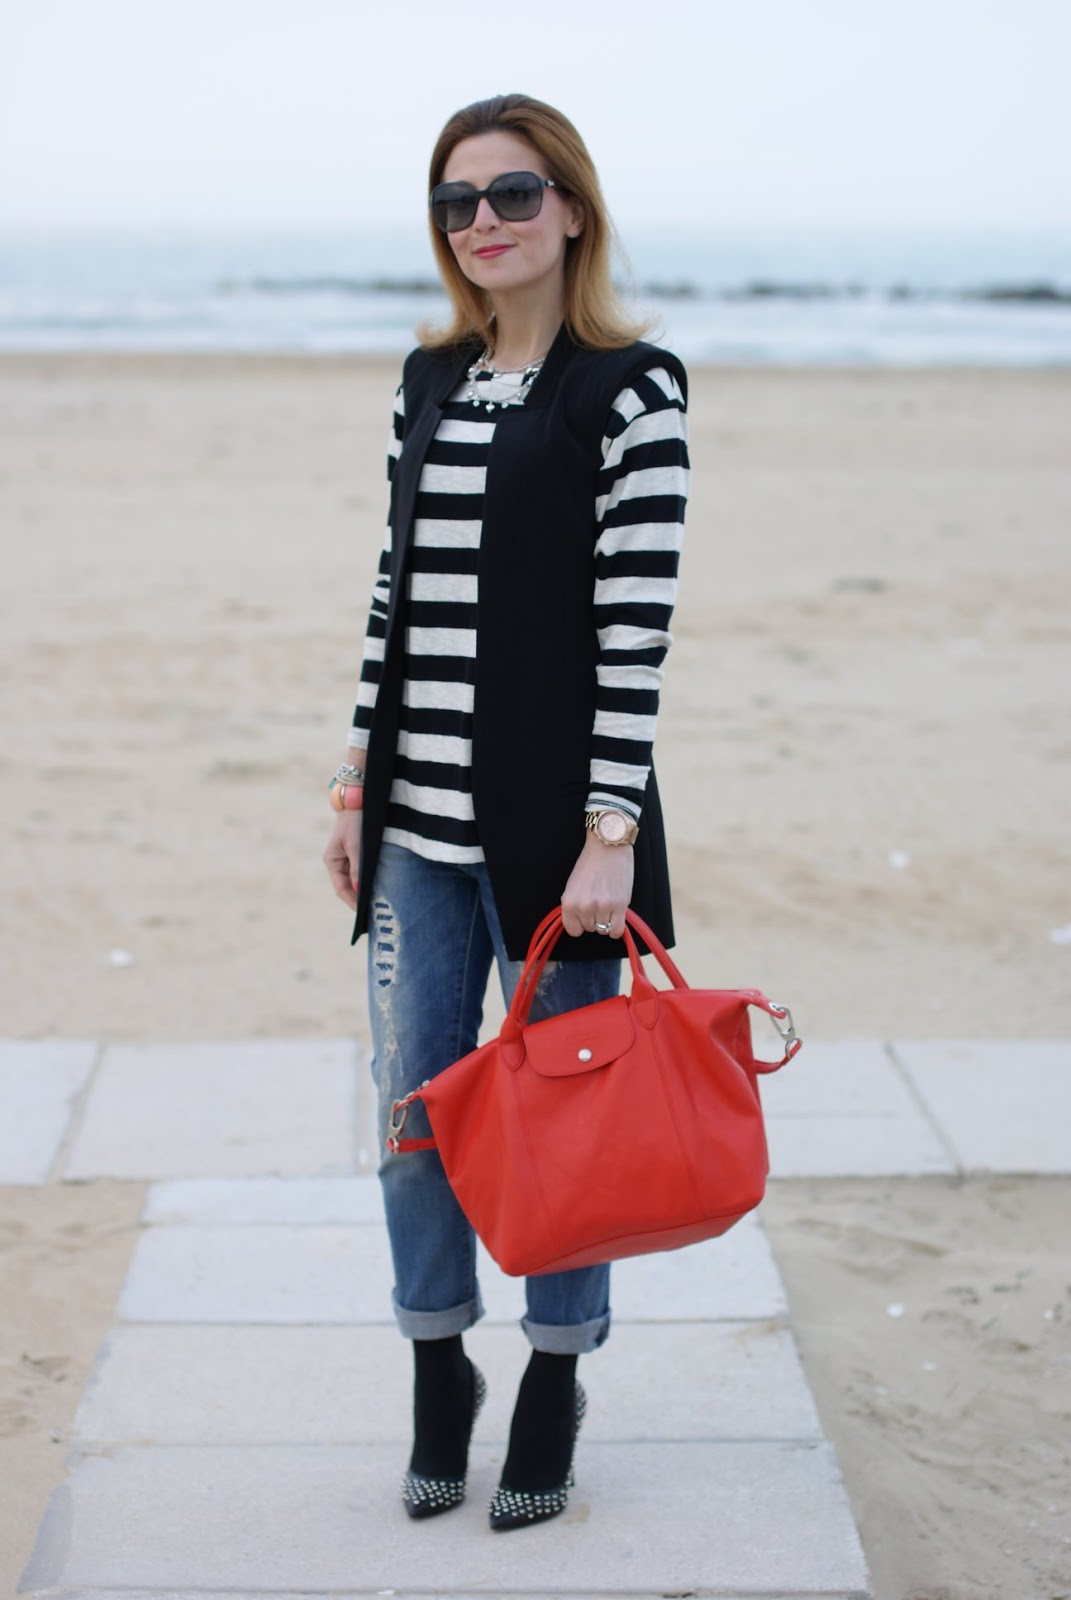 Longchamp bag boyfriend jeans and stripes fashion and - Pimkie boyfriend jeans ...